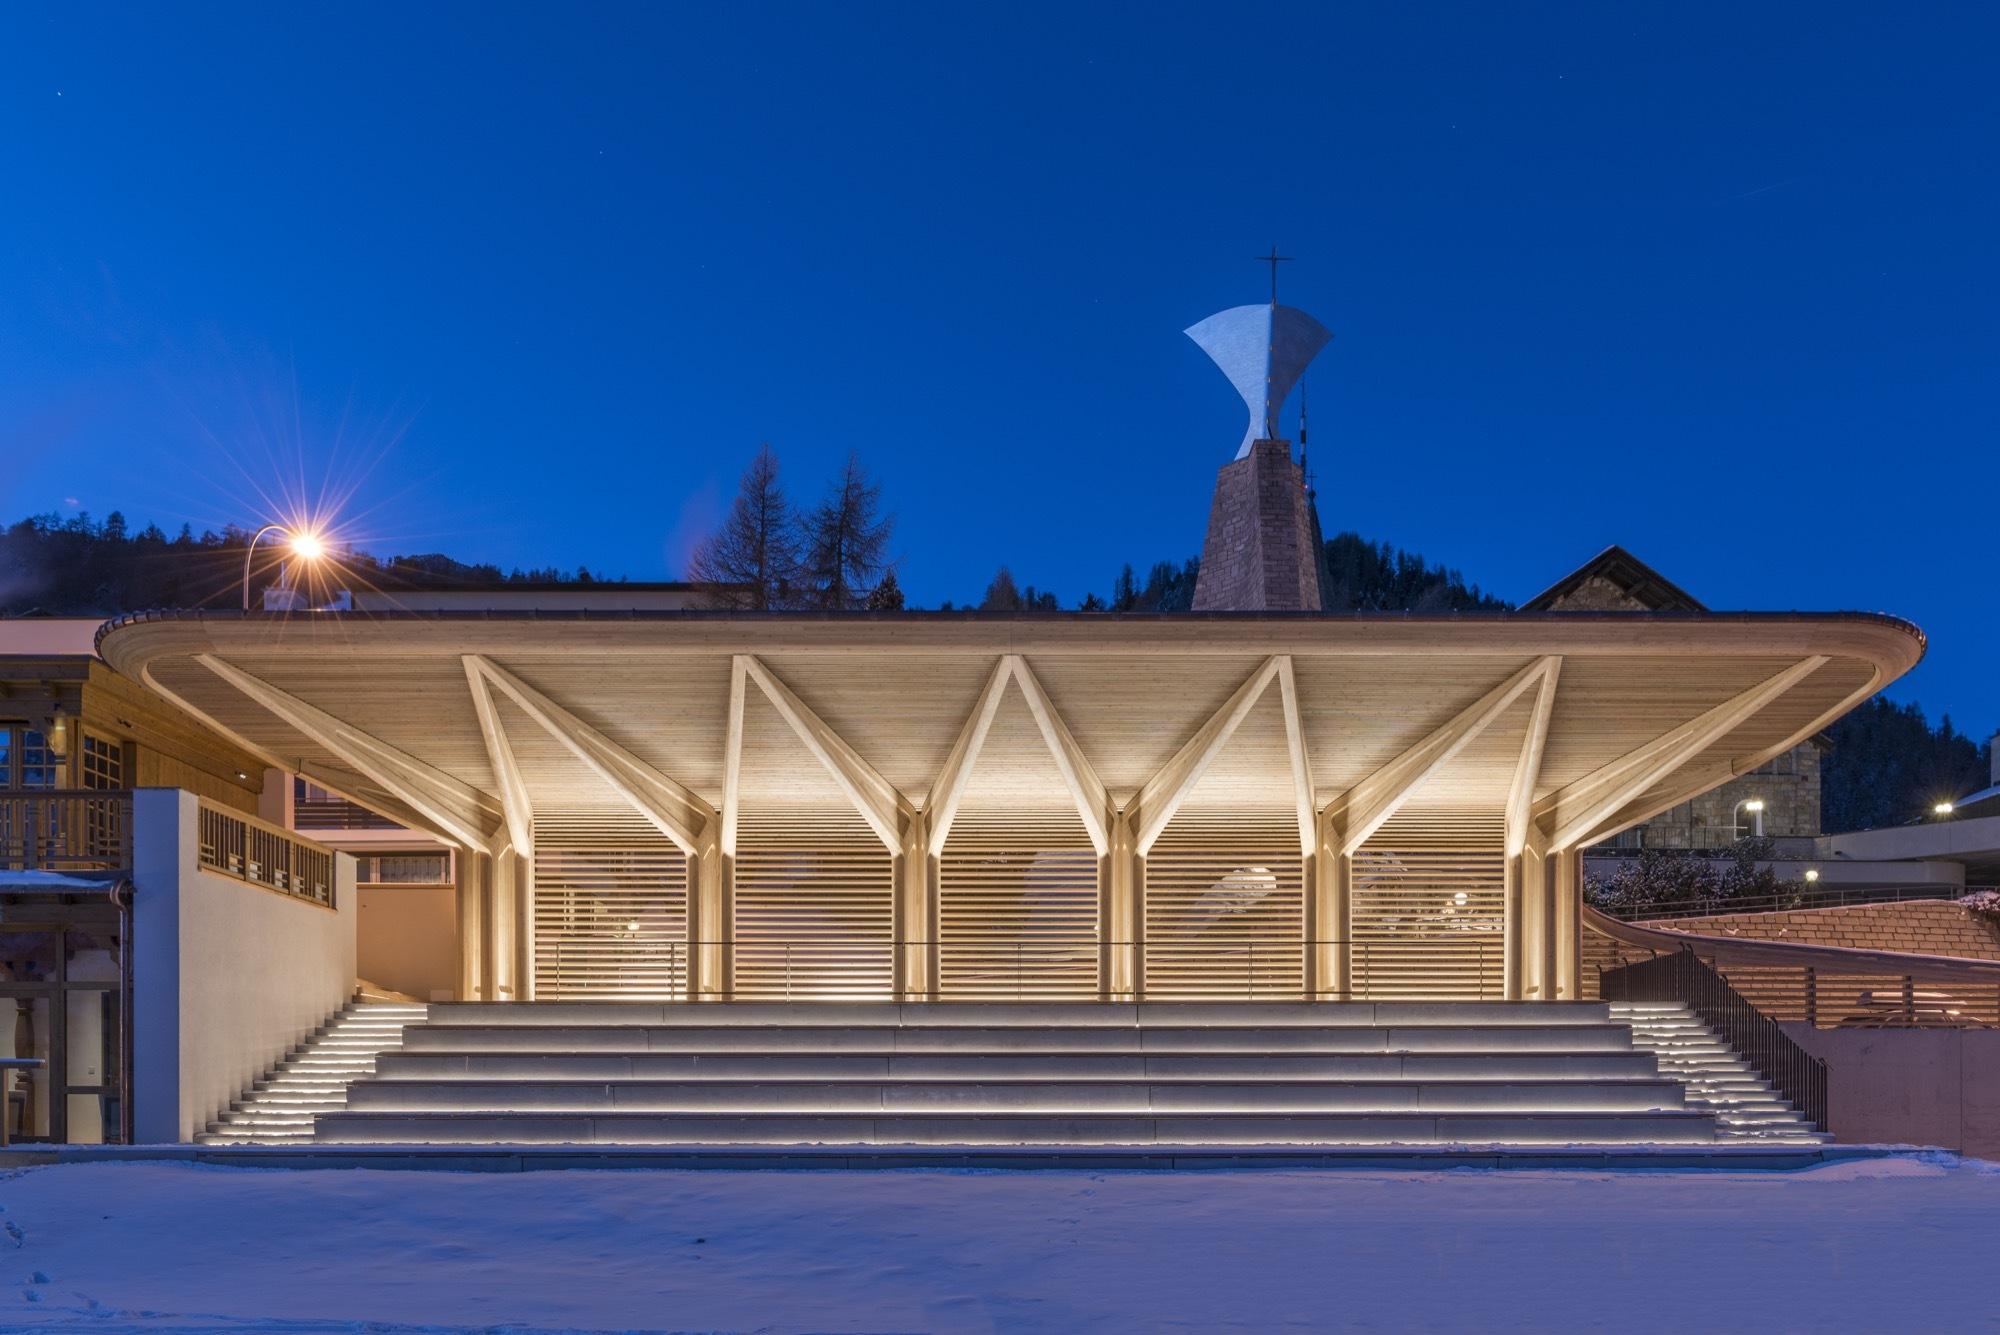 Kulm Eispavilion Foster Partners Archdaily